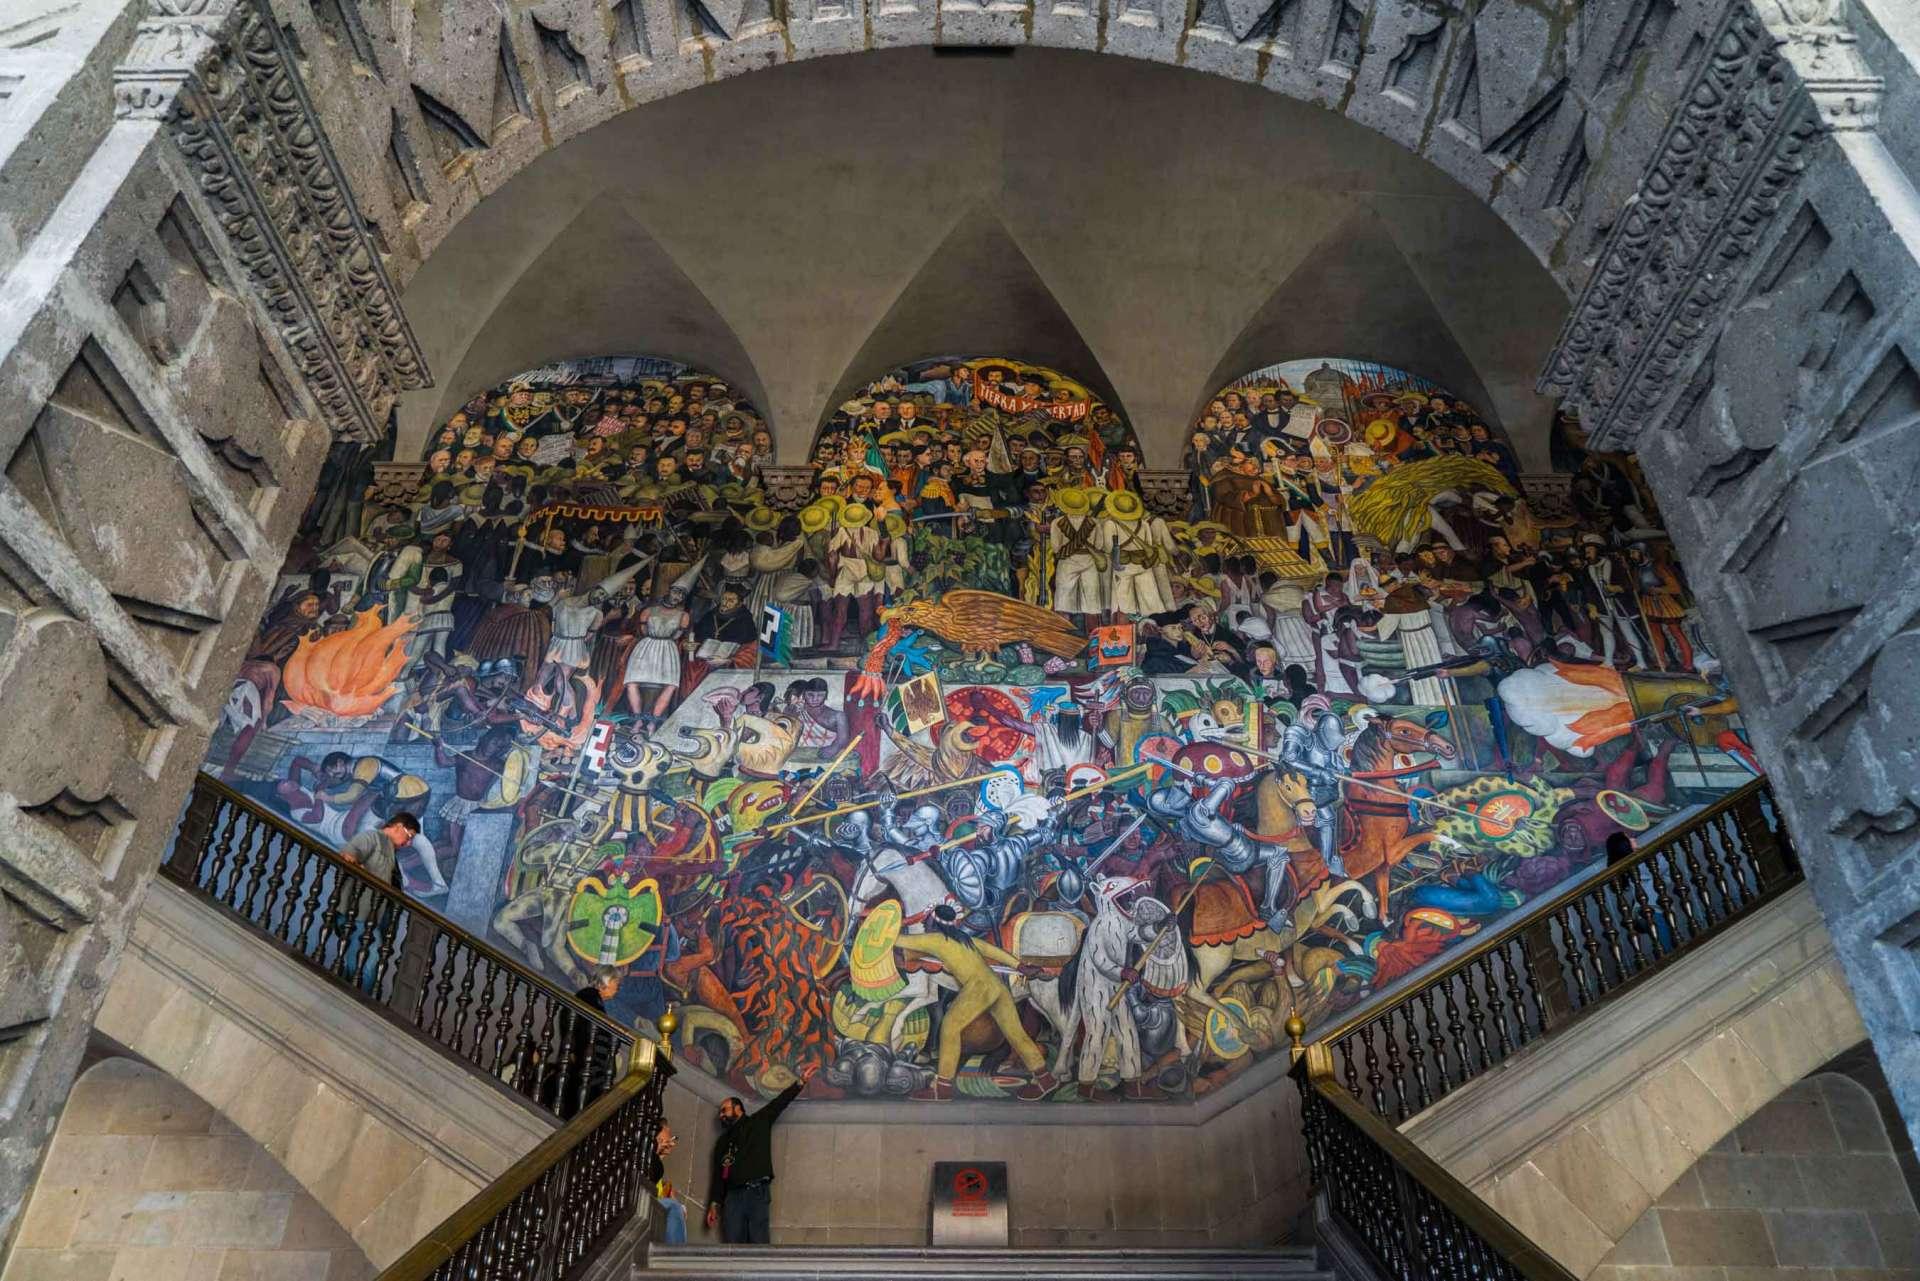 Palacio Nacional Diego Rivera mural Enrico Pescantini travel photographer